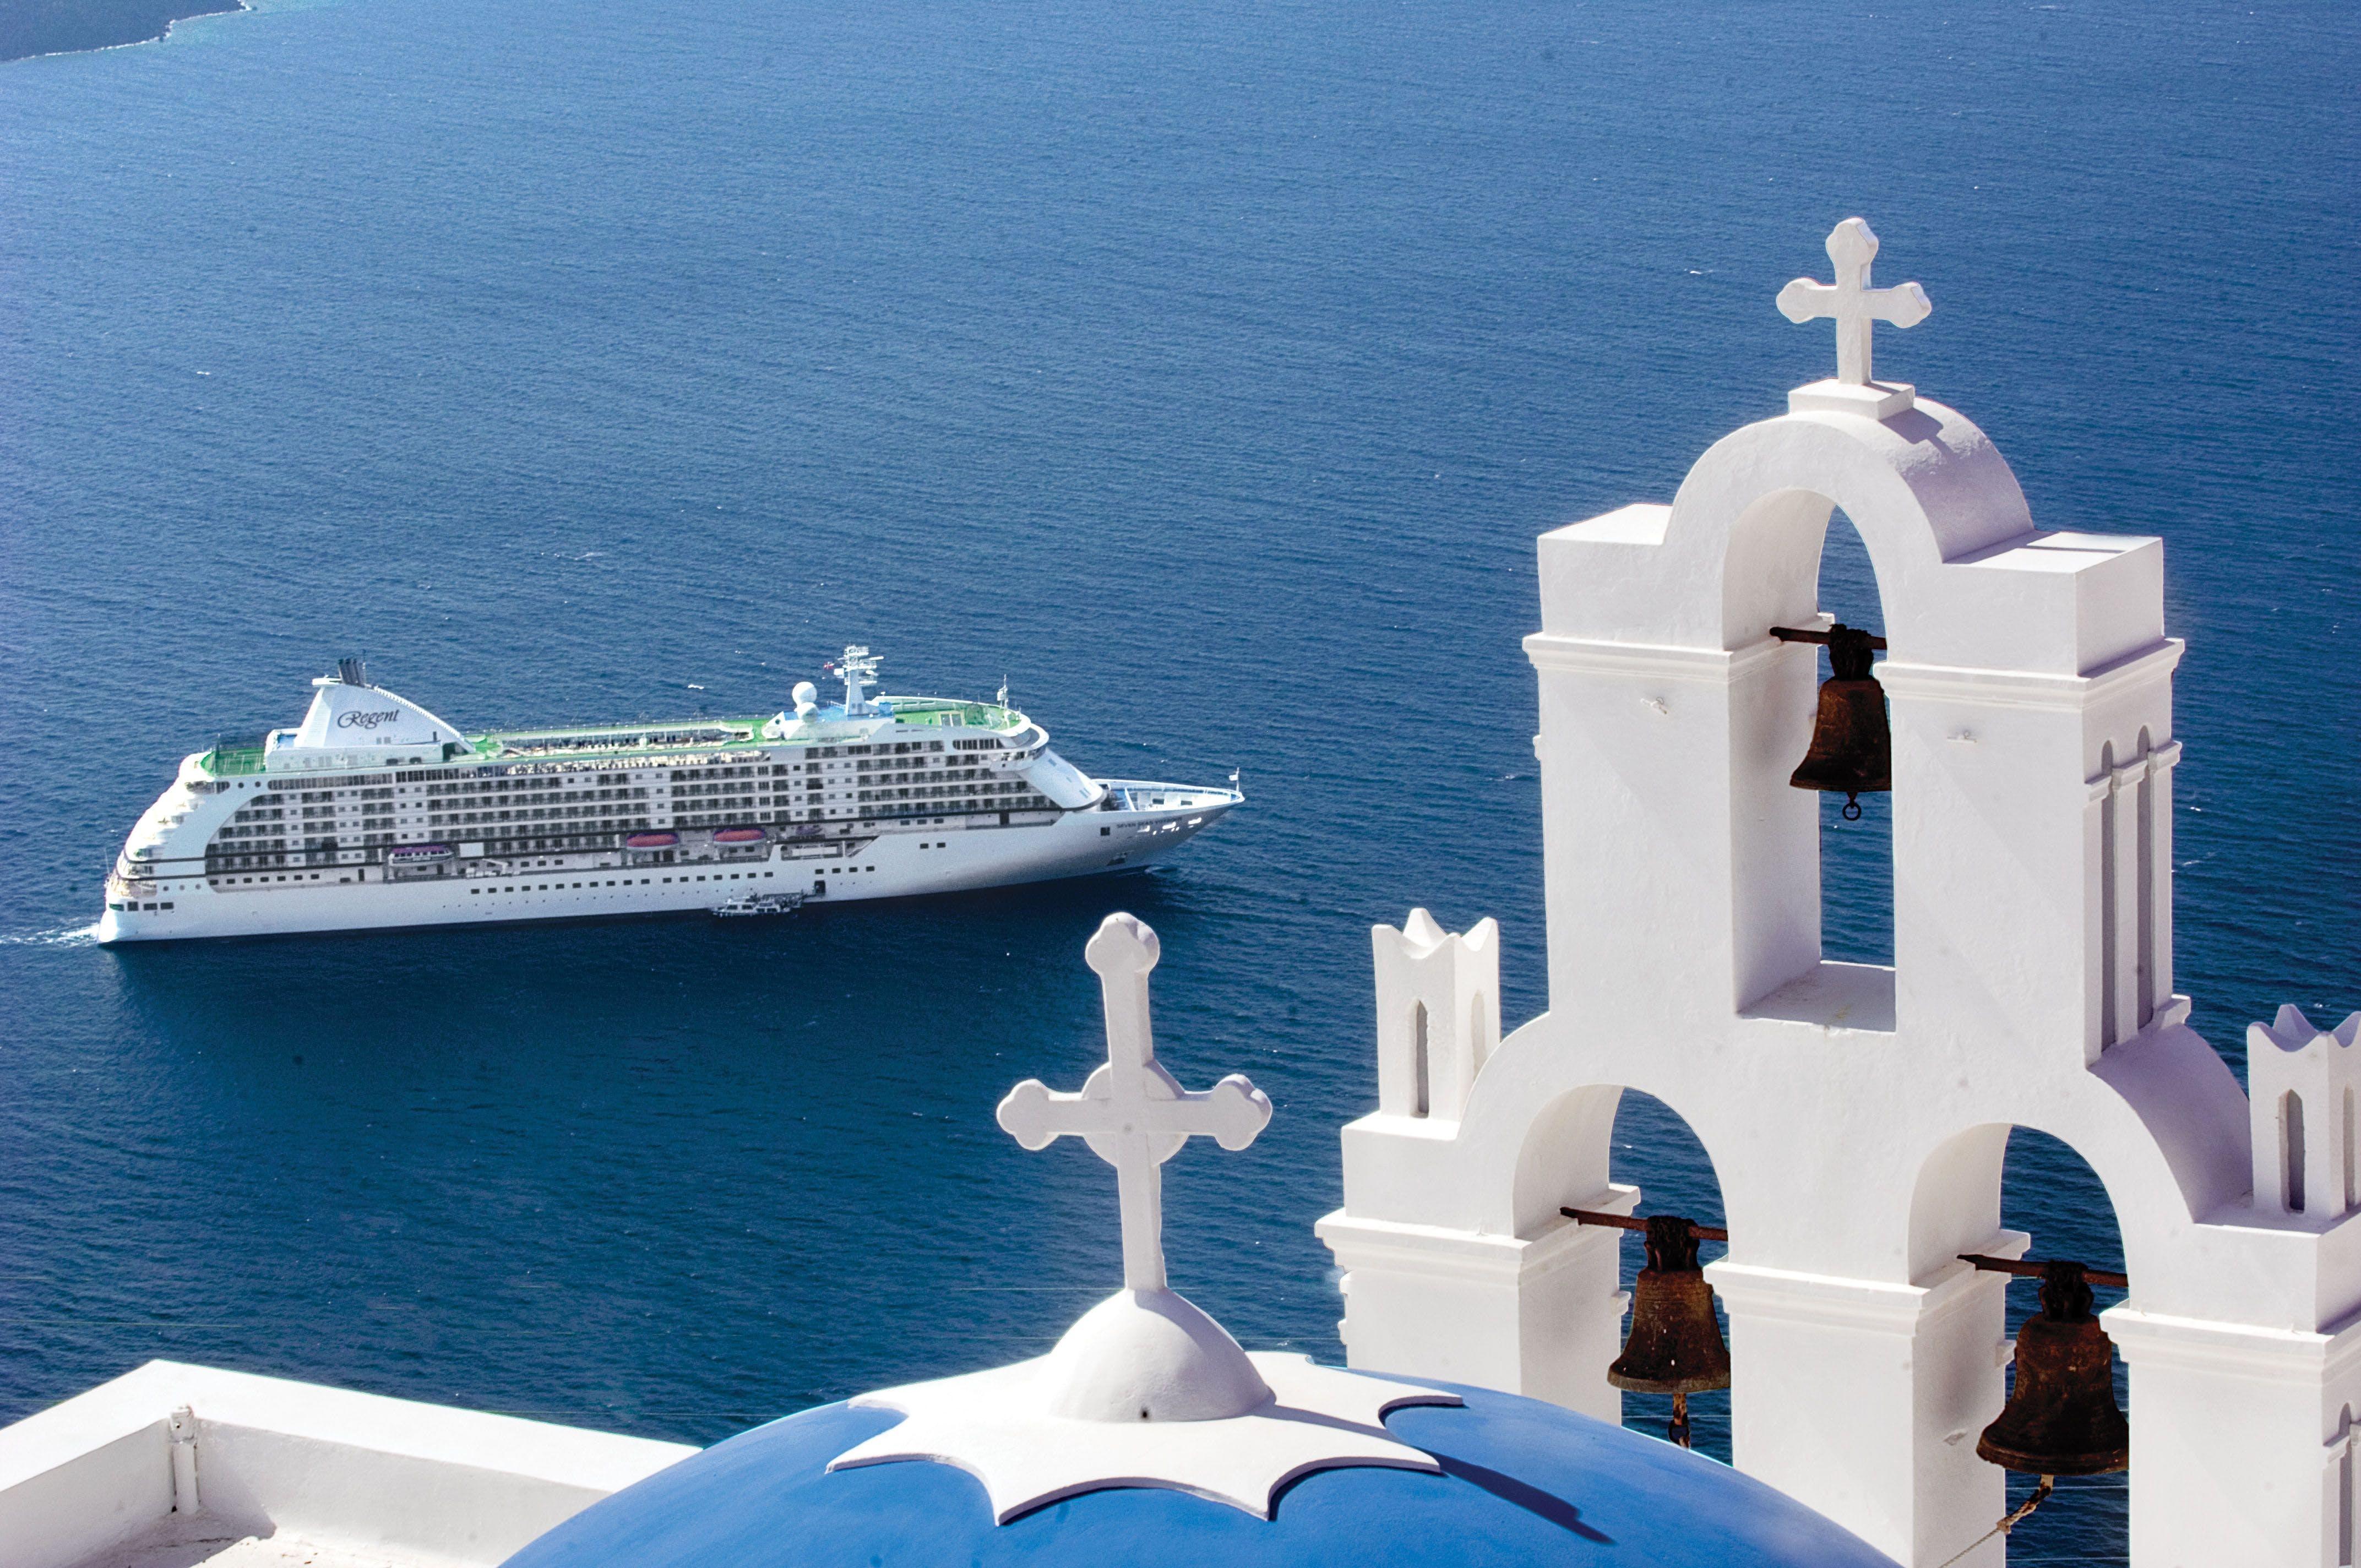 Regent ship in Santorini, Greece